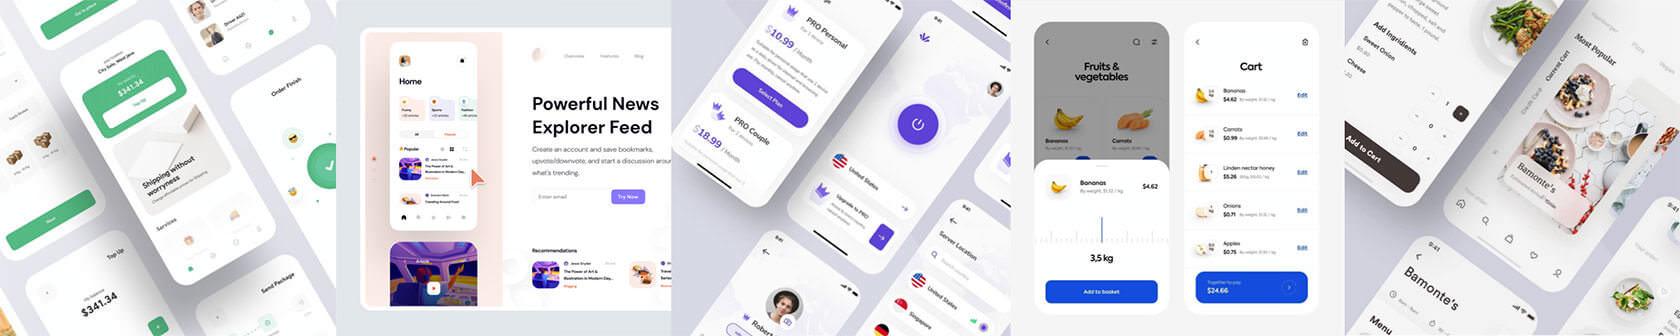 minimal-webdesign-guide-2